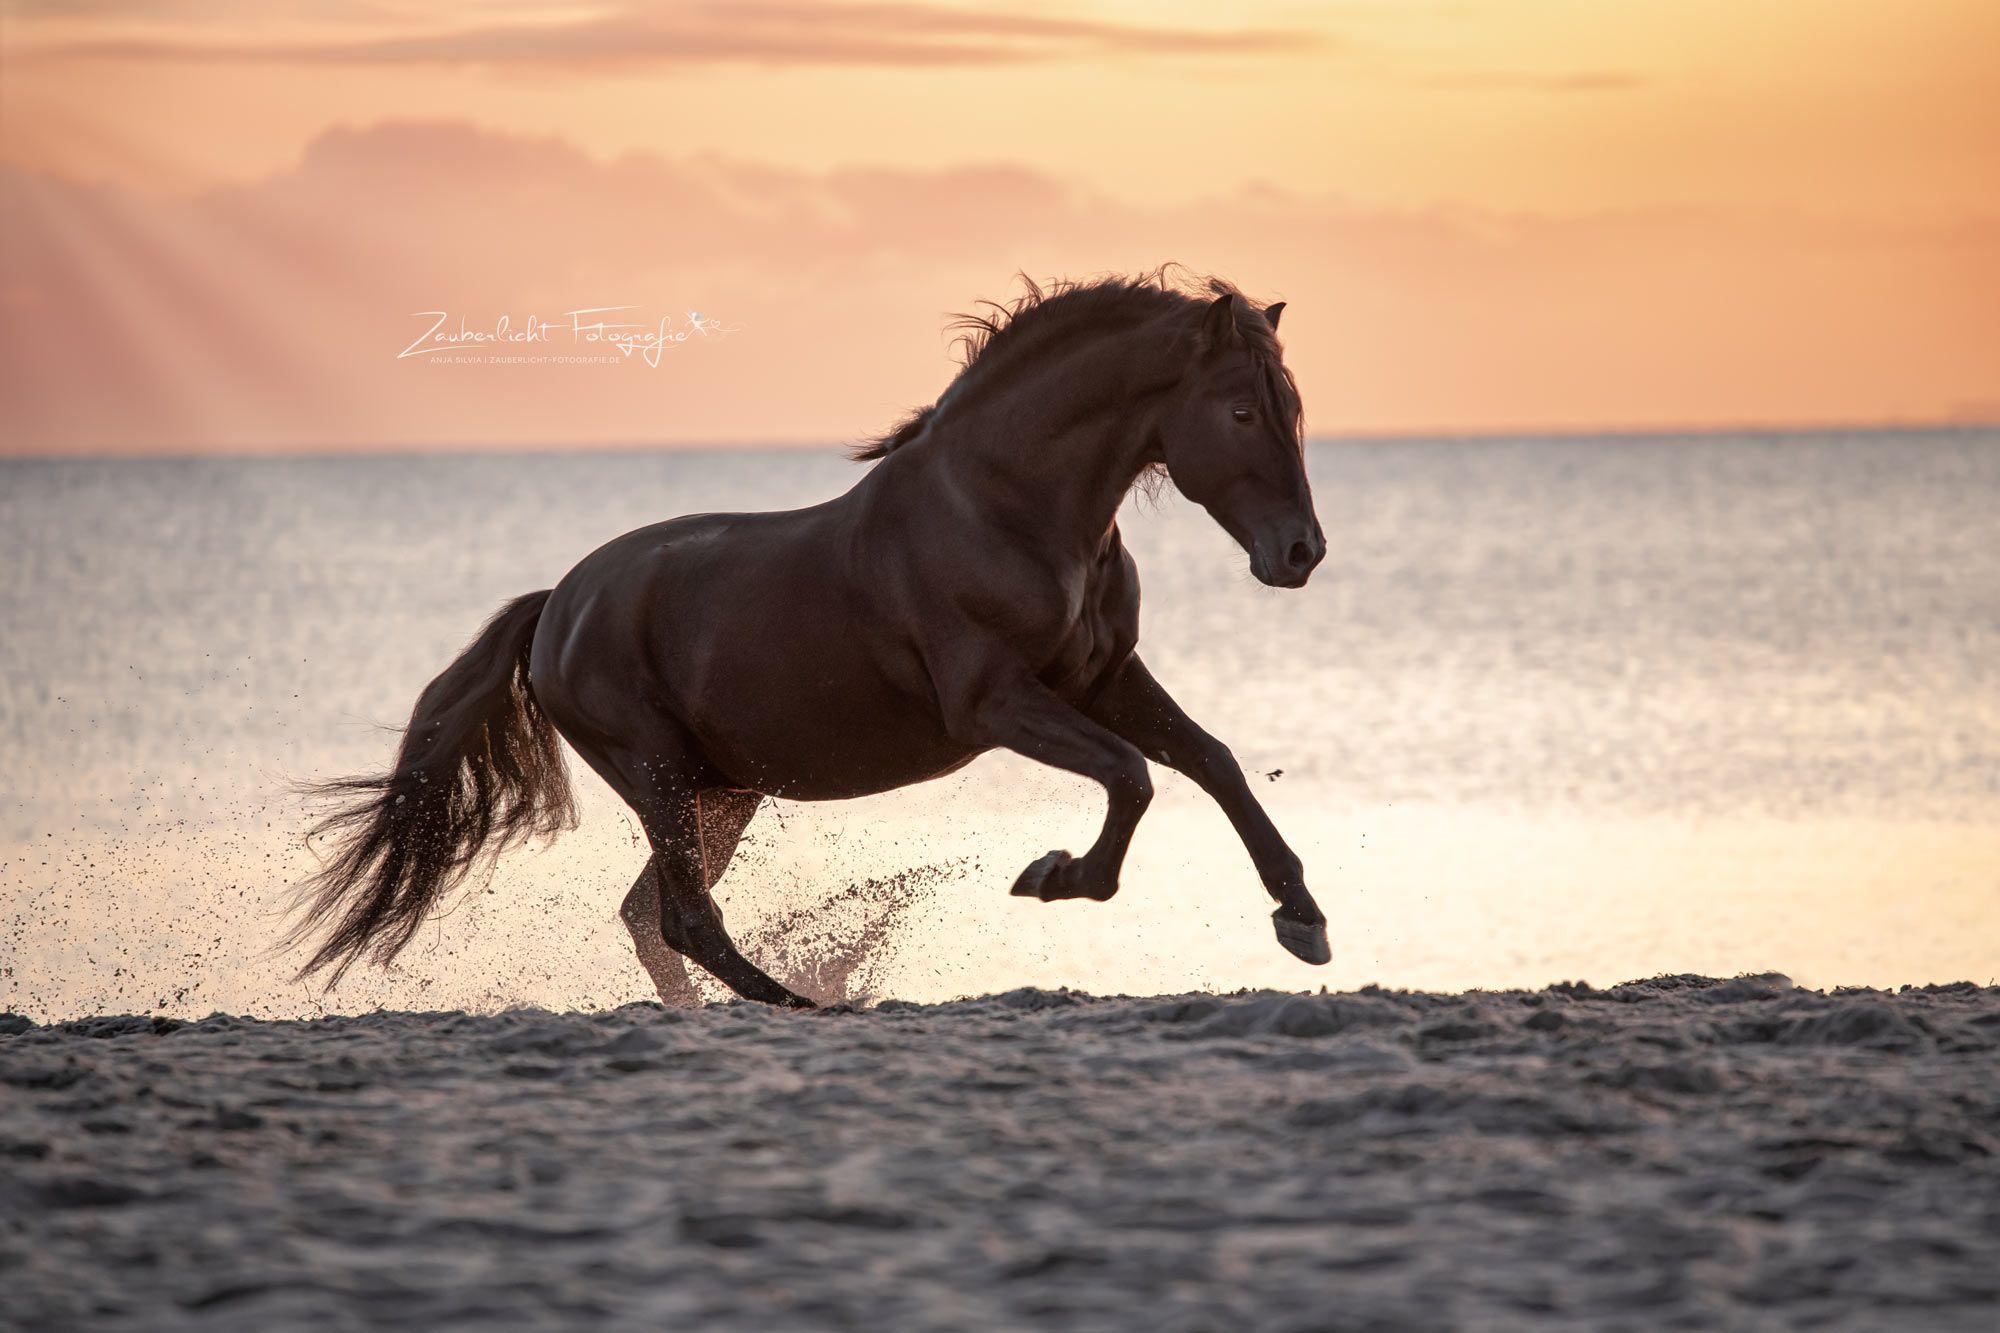 Pferd galopiert im Sonnenaufgang am Strand